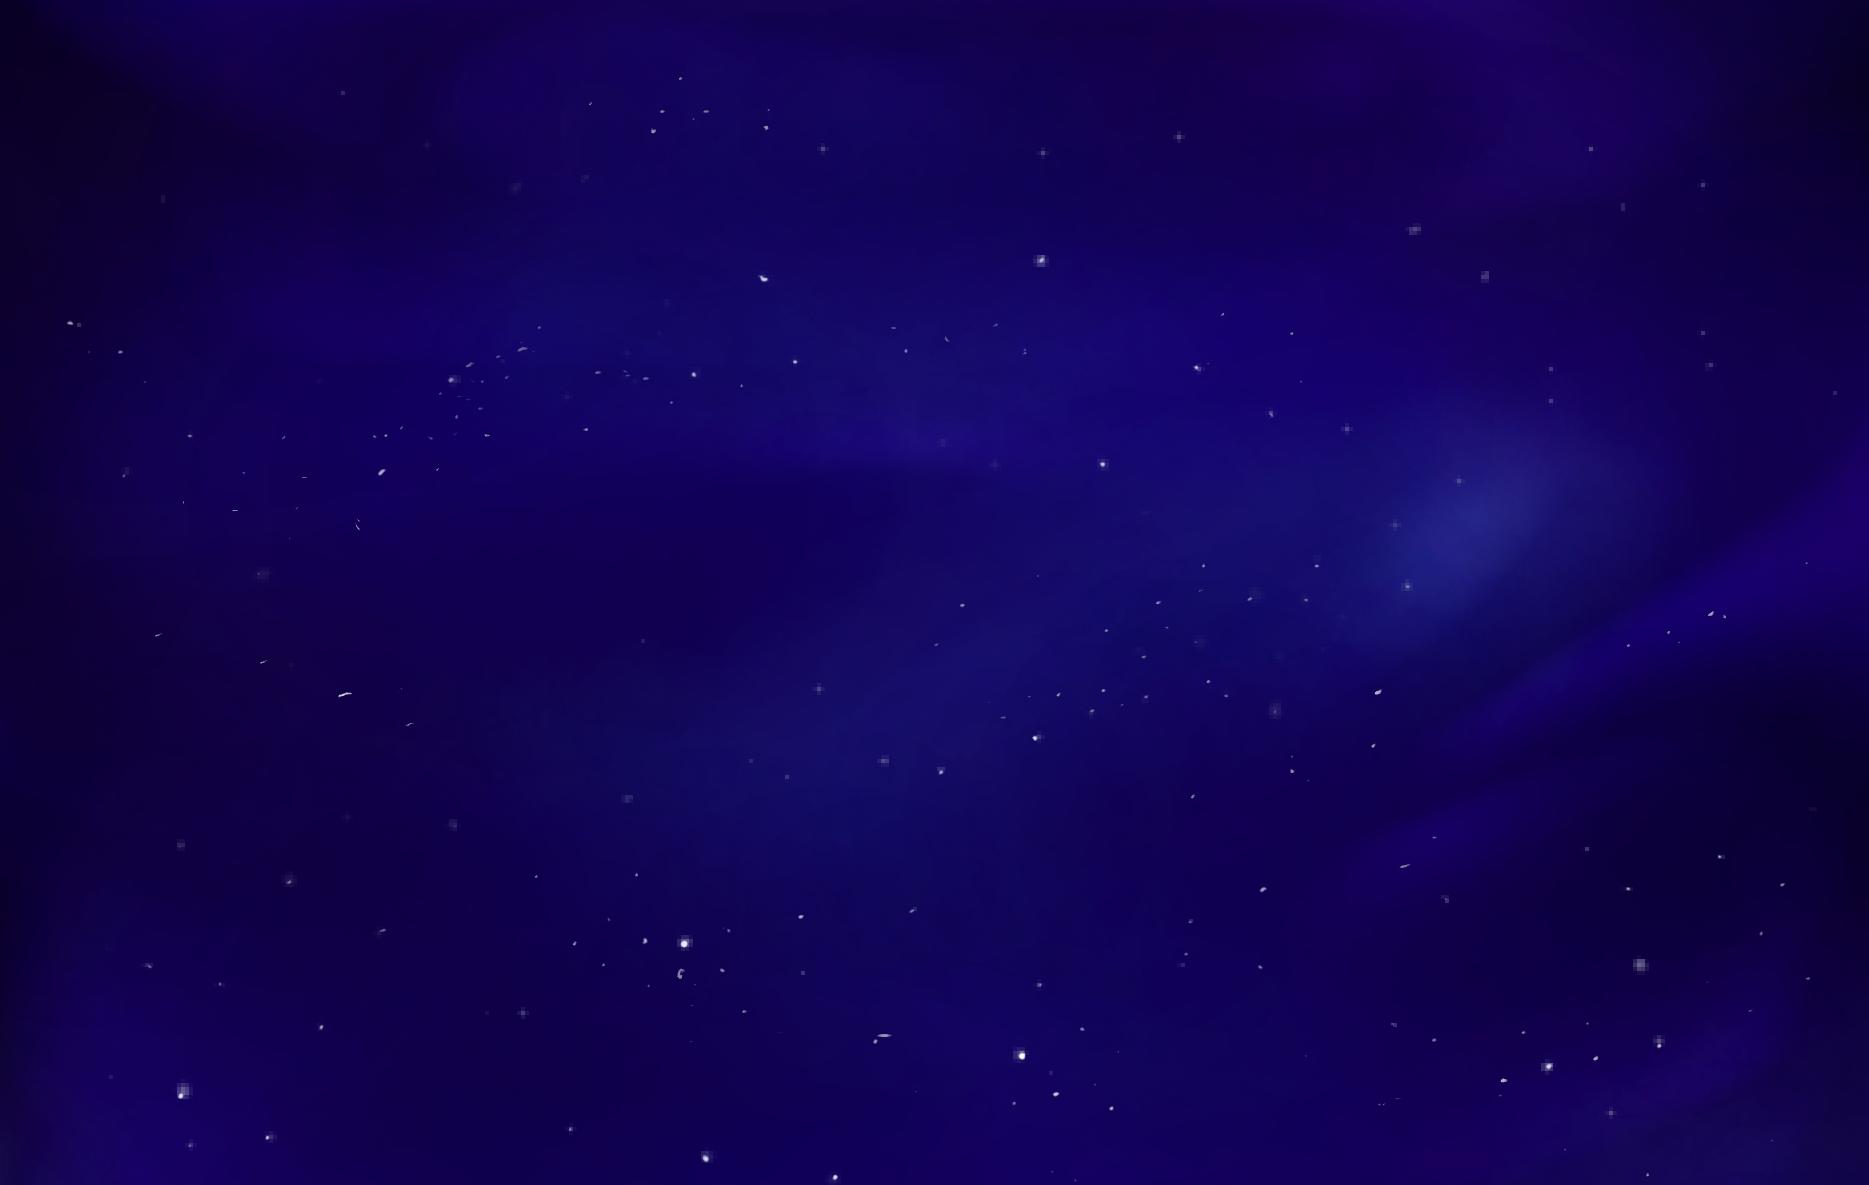 Starry background by raeri chan on deviantart